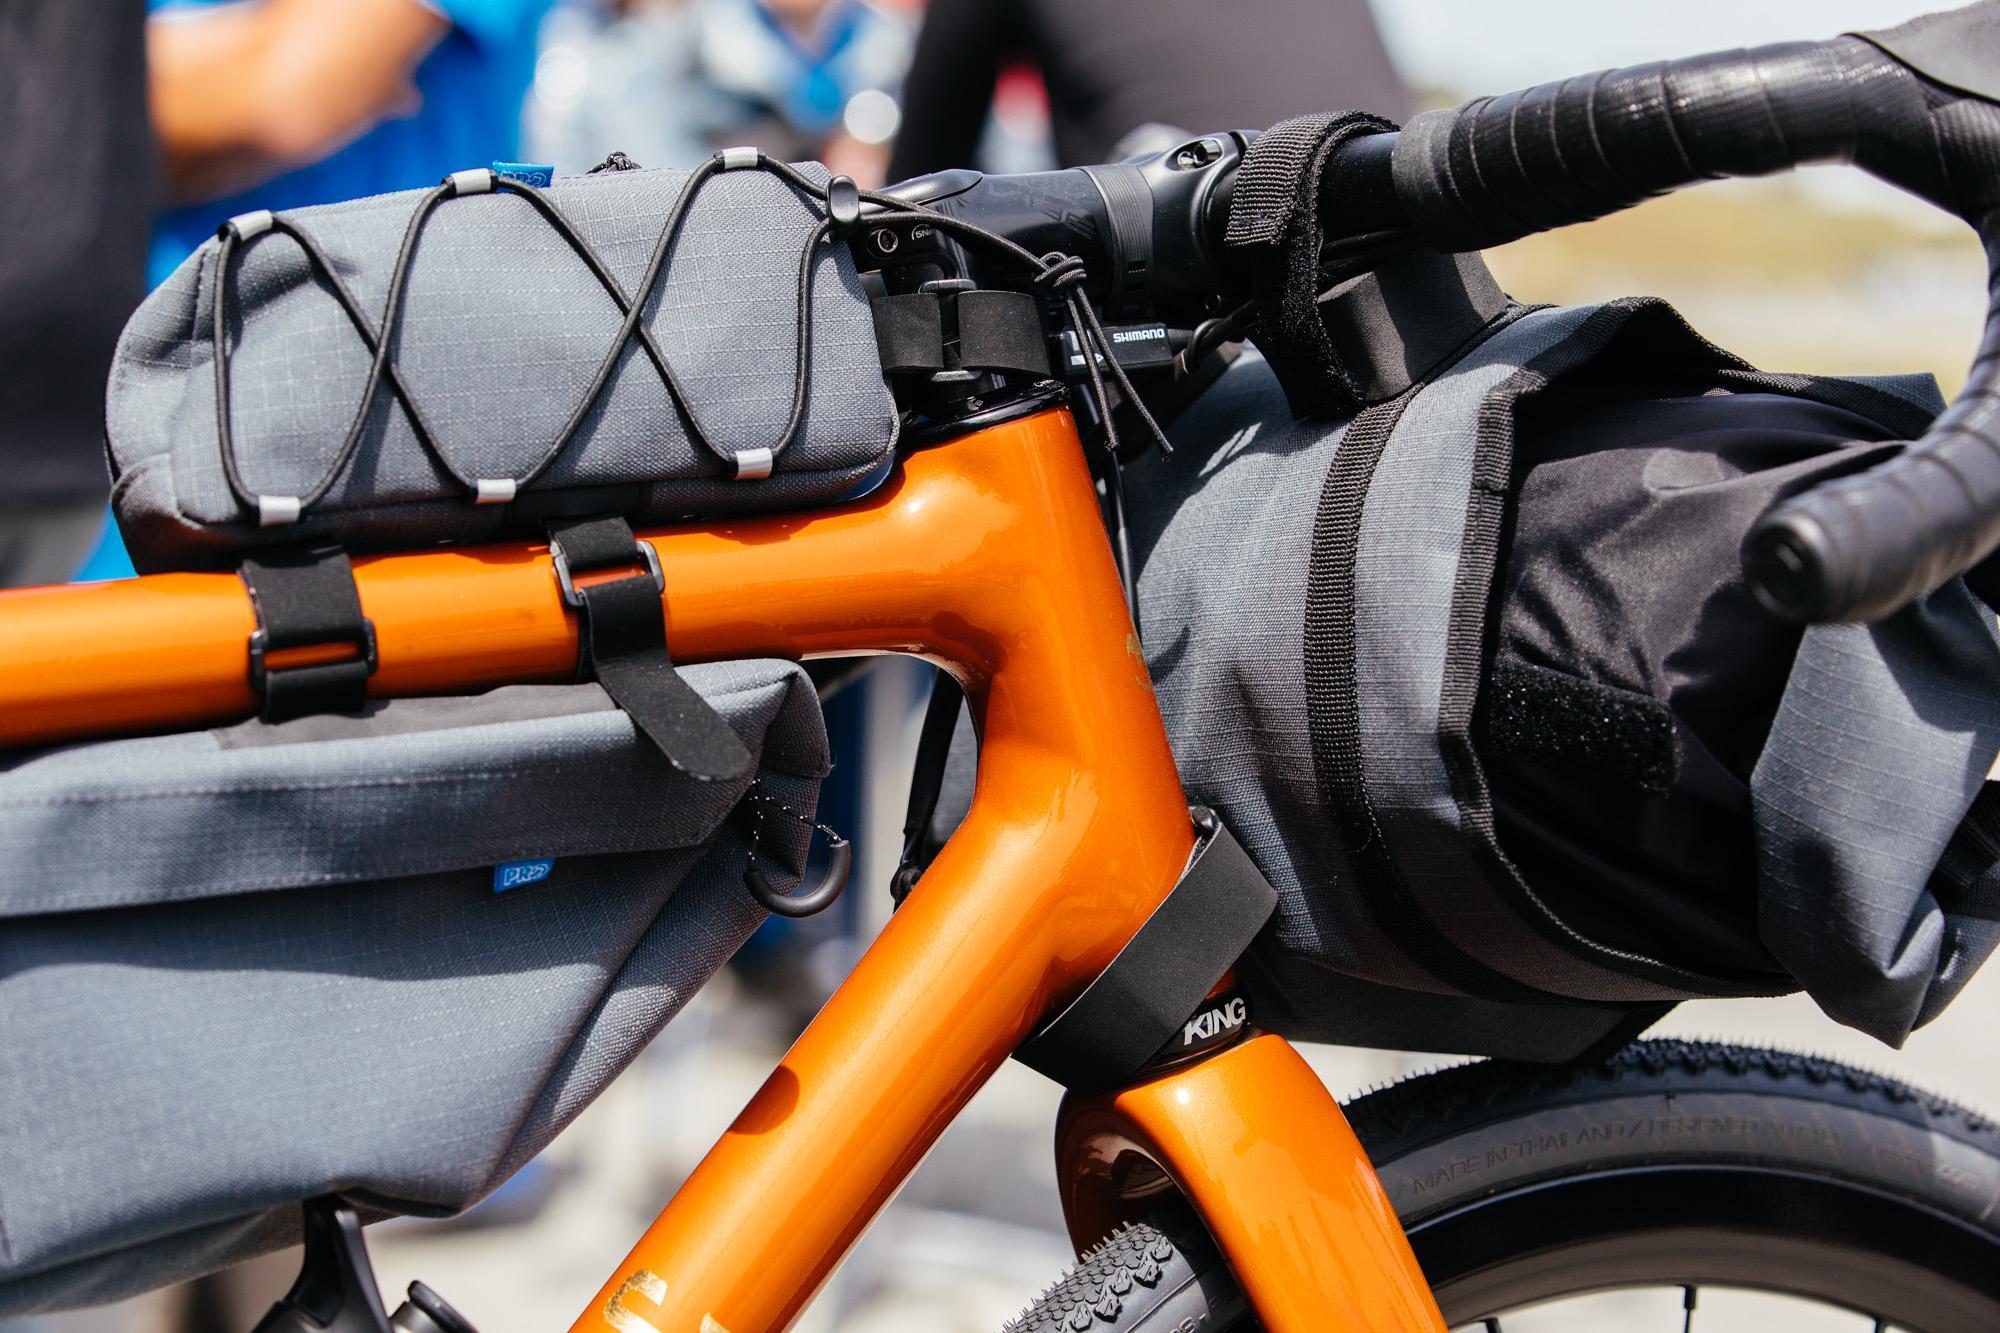 Shimano's PRO Bikepacking line